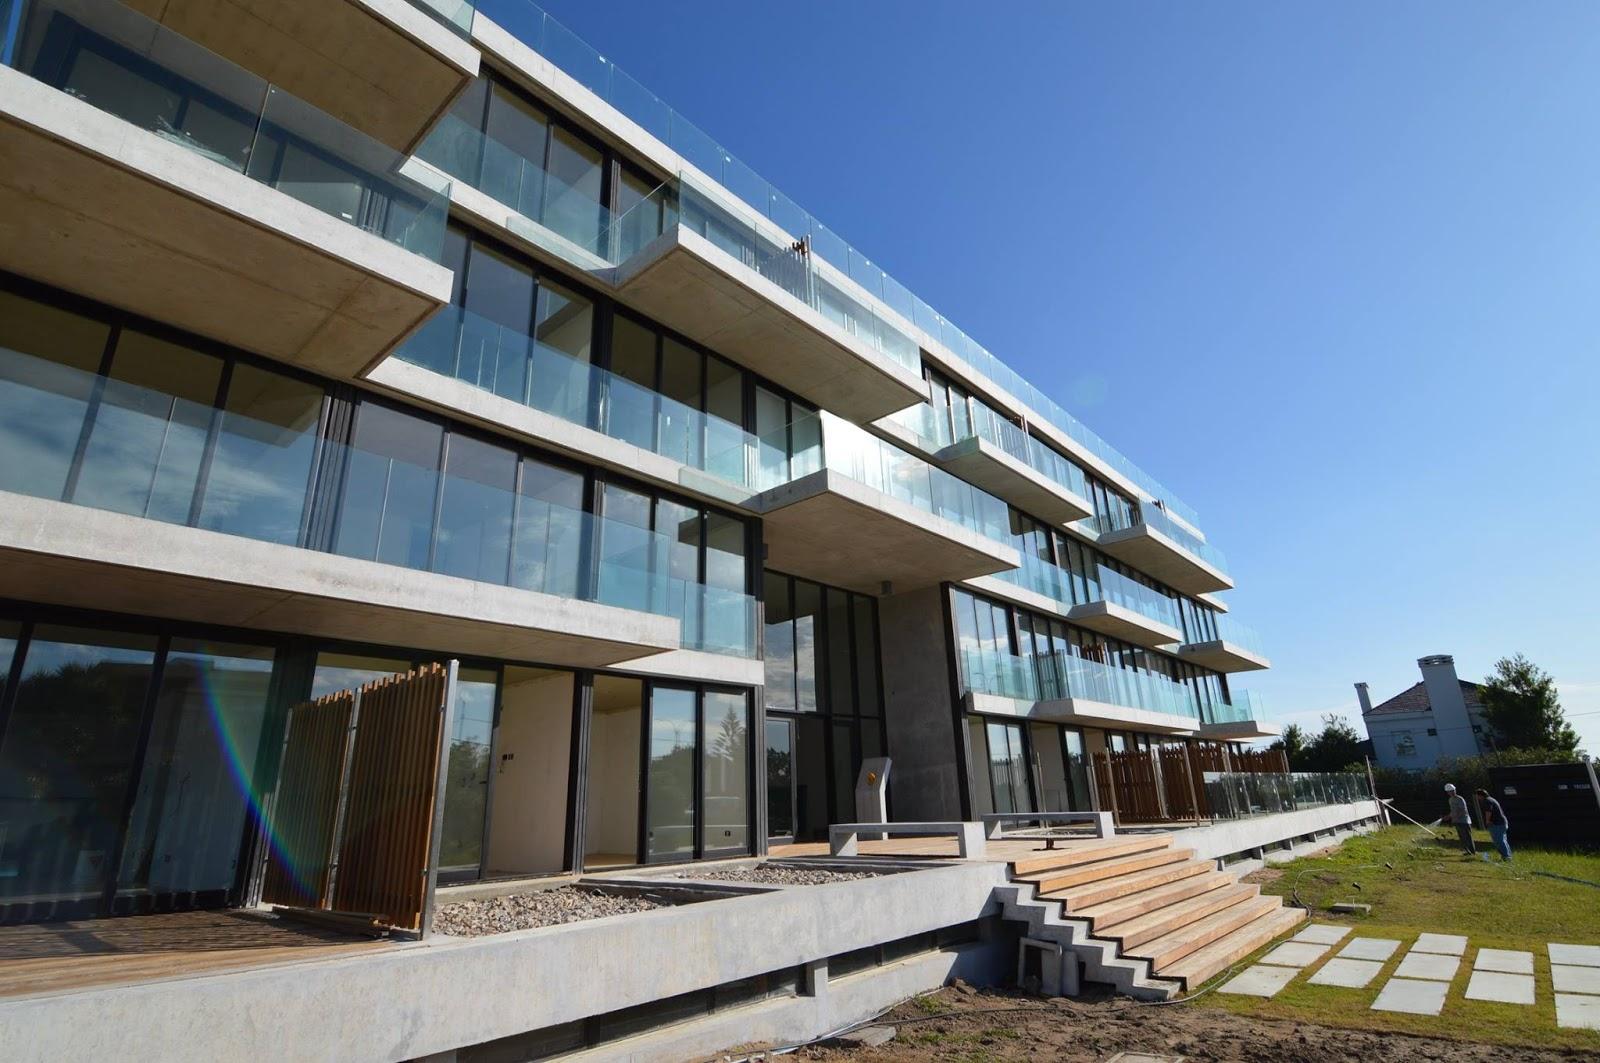 Estudio leonardo noguez arquitectos - Estudio 3 arquitectos ...